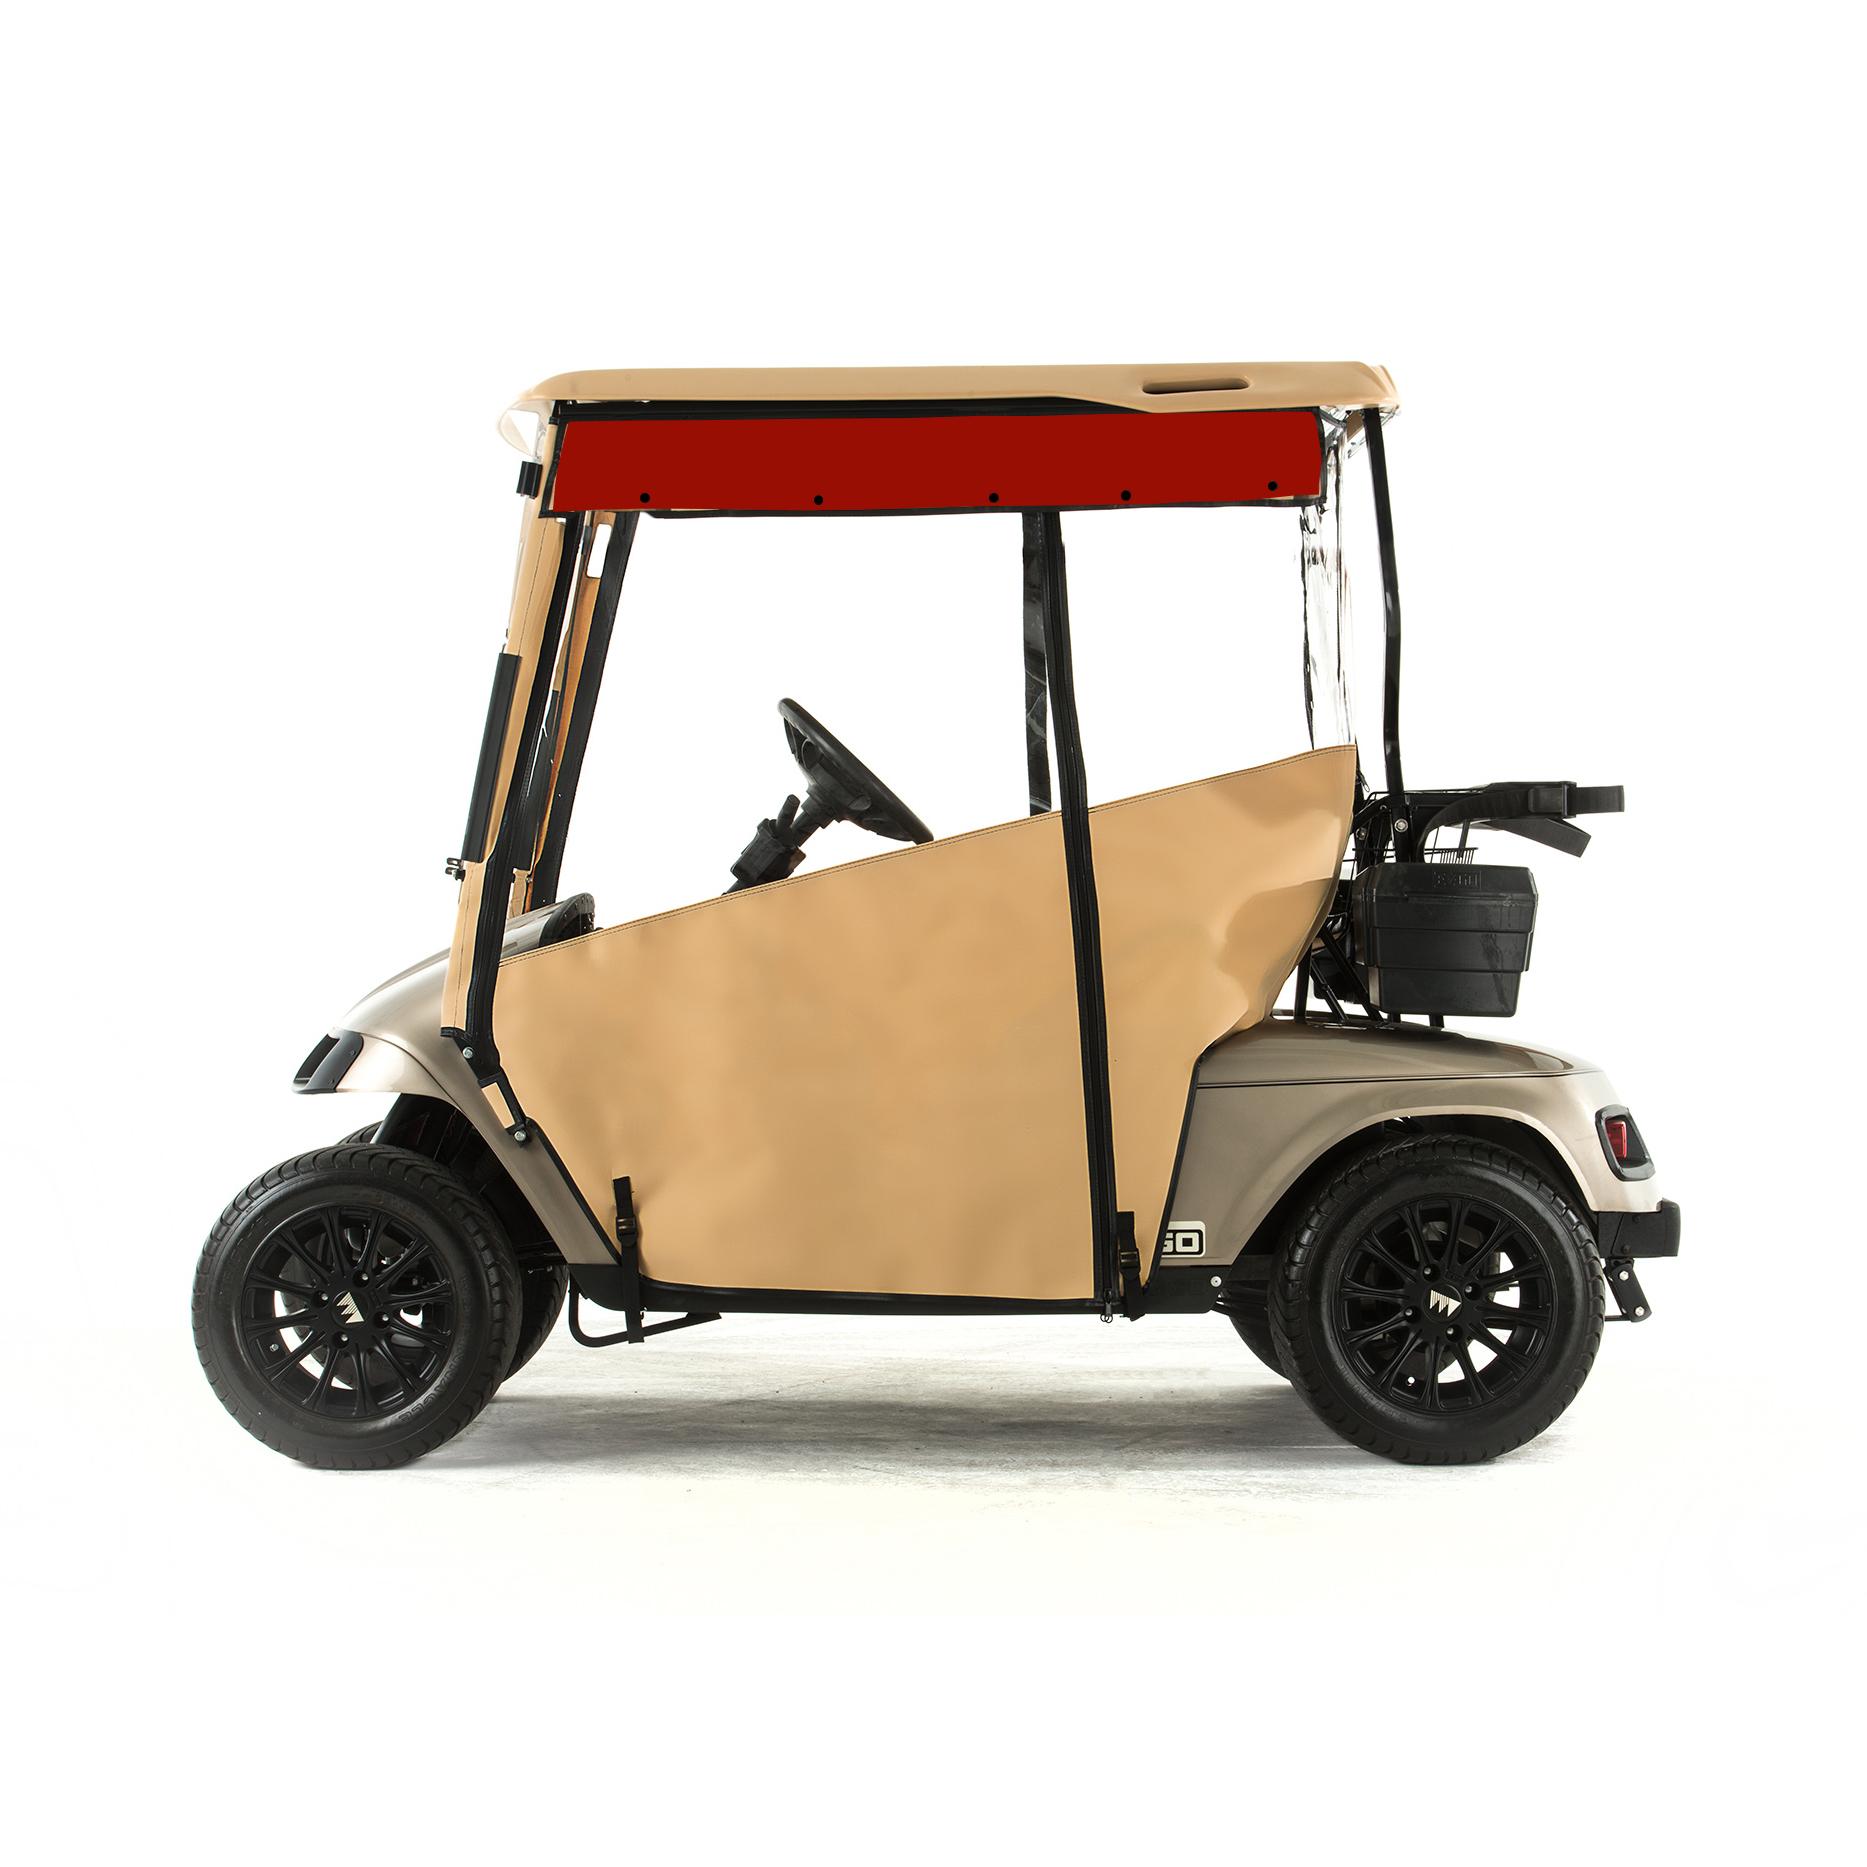 EZGO TXT Golf Cart PRO-TOURING Sunbrella Track Enclosure - Linen | Green Line Golf Cart Sunbrella Cover on national golf cart covers, canvas golf cart covers, classic golf cart covers, golf cart canopy covers, vinyl golf cart covers, star golf cart covers, door works golf cart covers, club car golf cart rain covers, buggies unlimited golf cart covers, clear plastic golf cart covers, custom golf cart covers, discount golf cart covers, sam's club golf cart covers, rail golf cart covers, portable golf cart covers, golf cart cloth seat covers, eevelle golf cart covers, 3 sided golf cart covers, yamaha golf cart covers, harley golf cart seat covers,